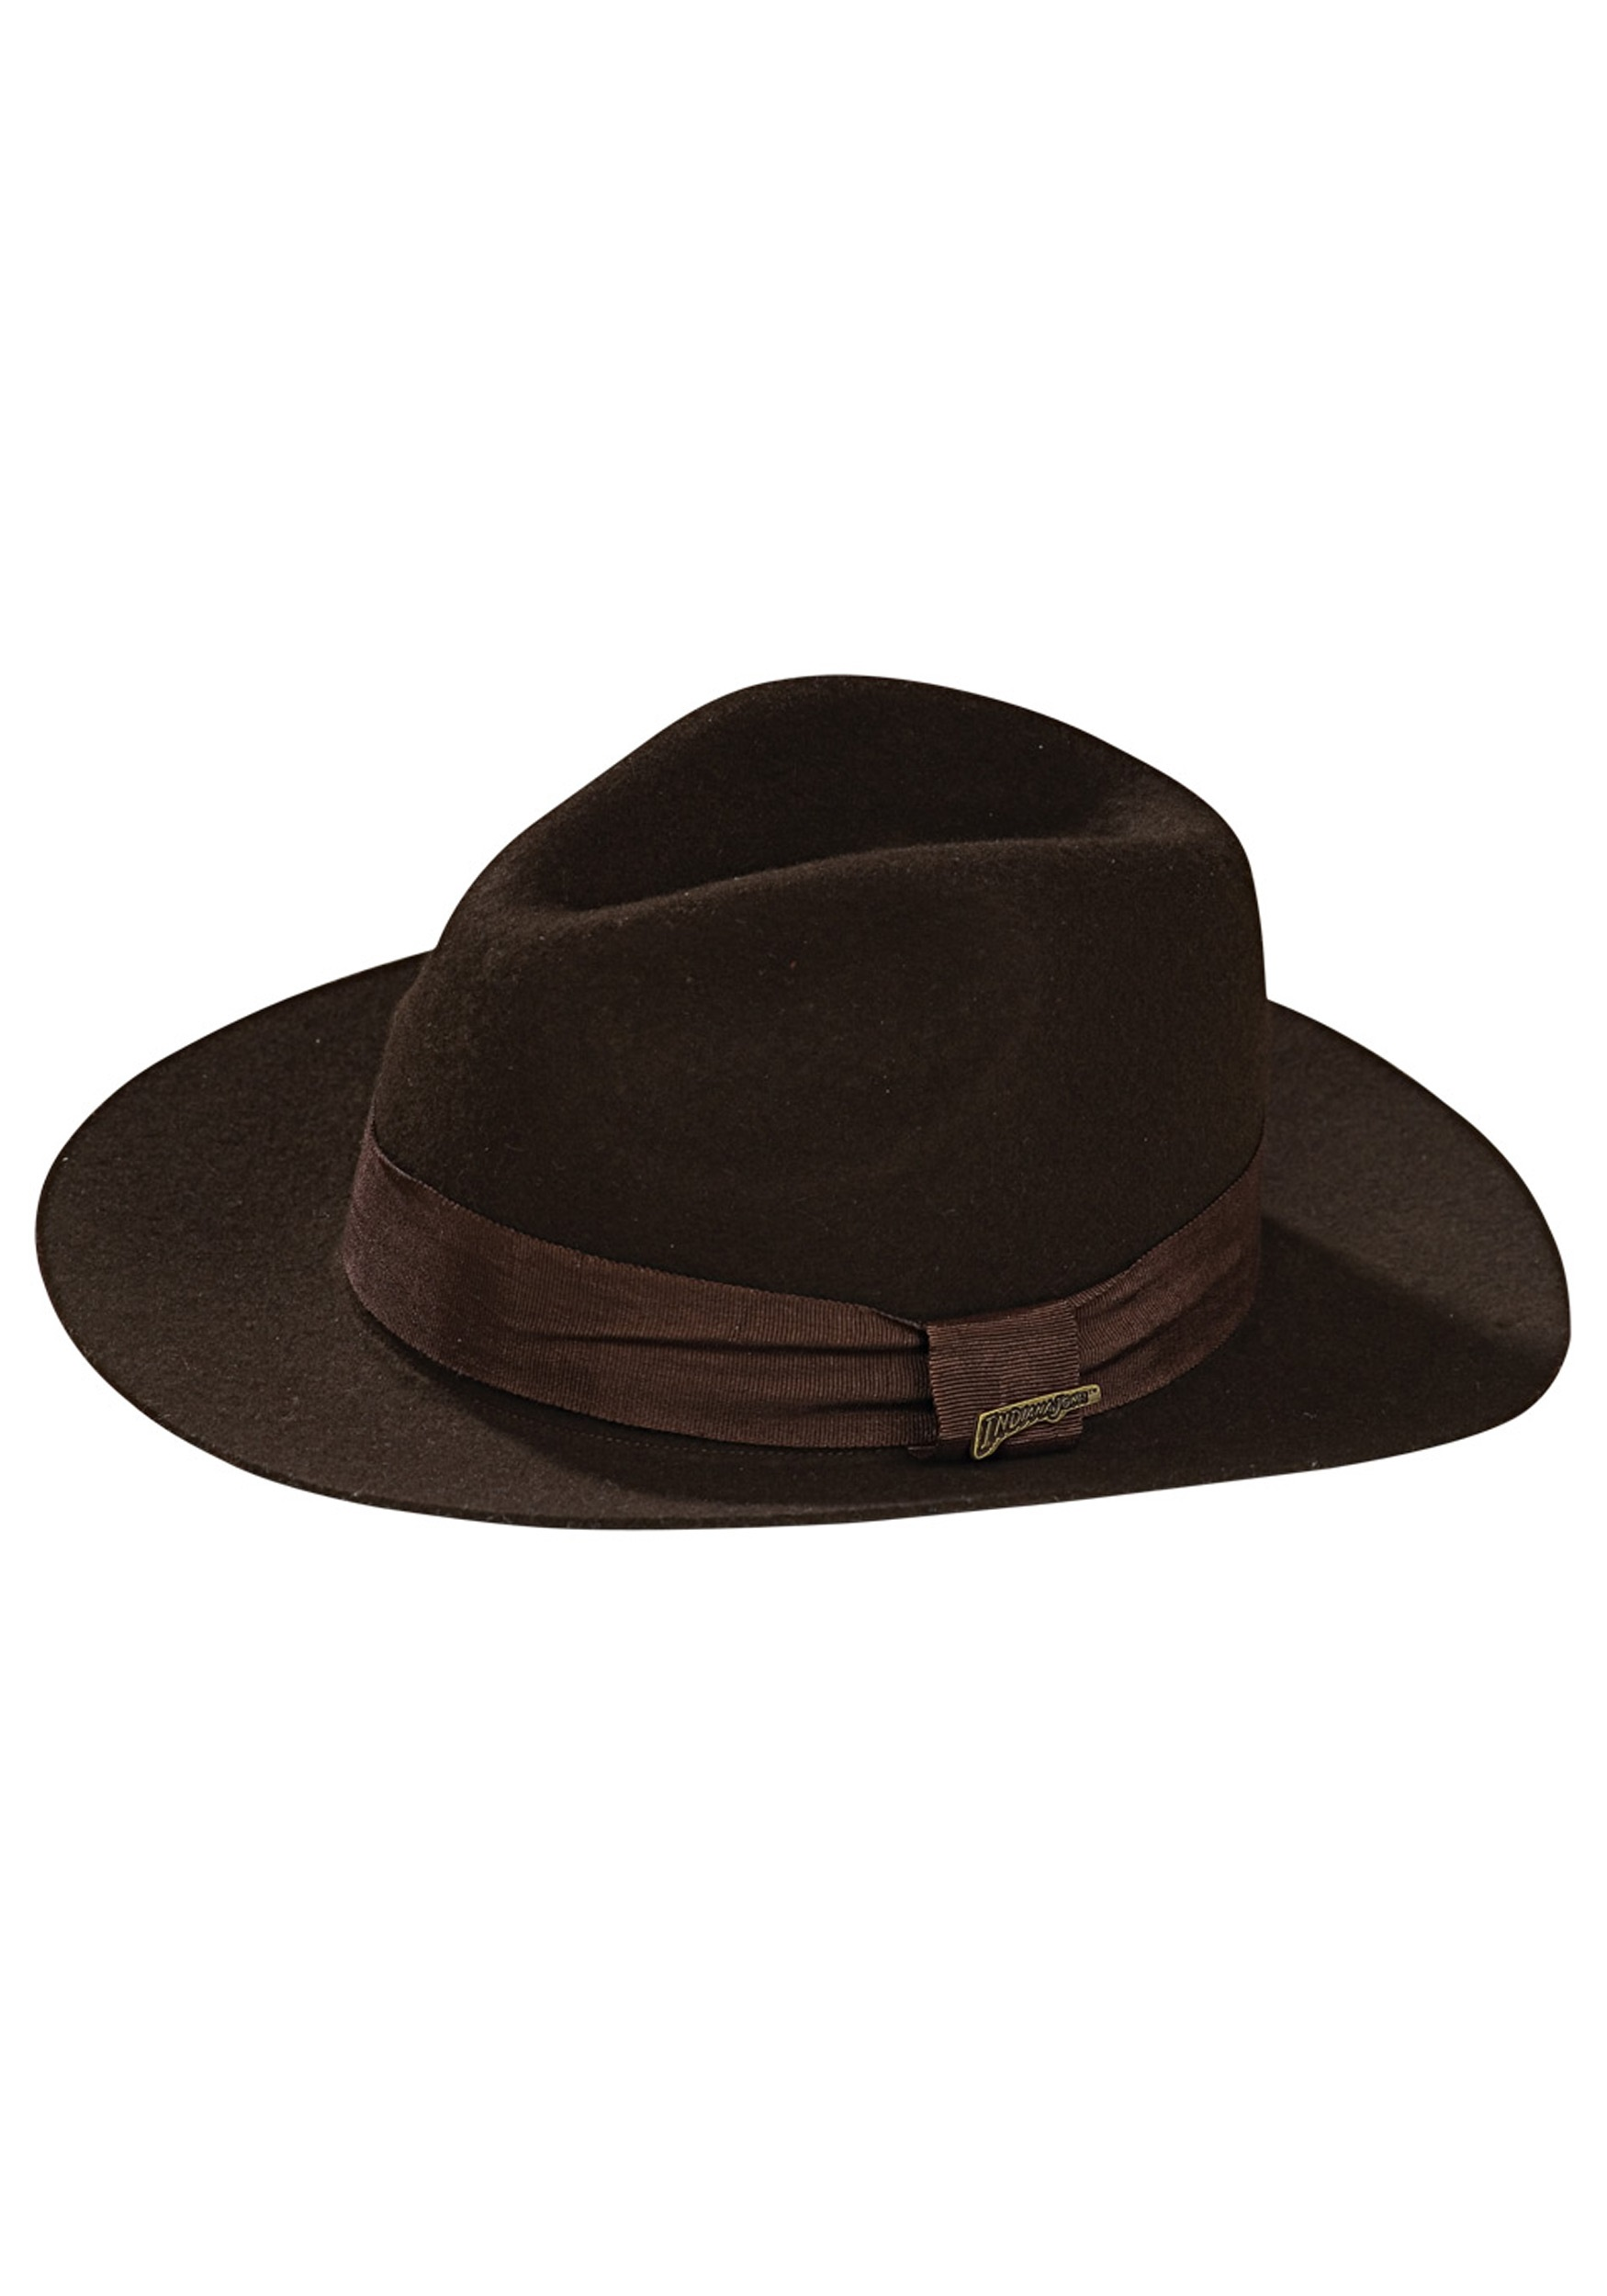 28a5996ee16e9 Sombrero Indiana Jones deluxe para niños